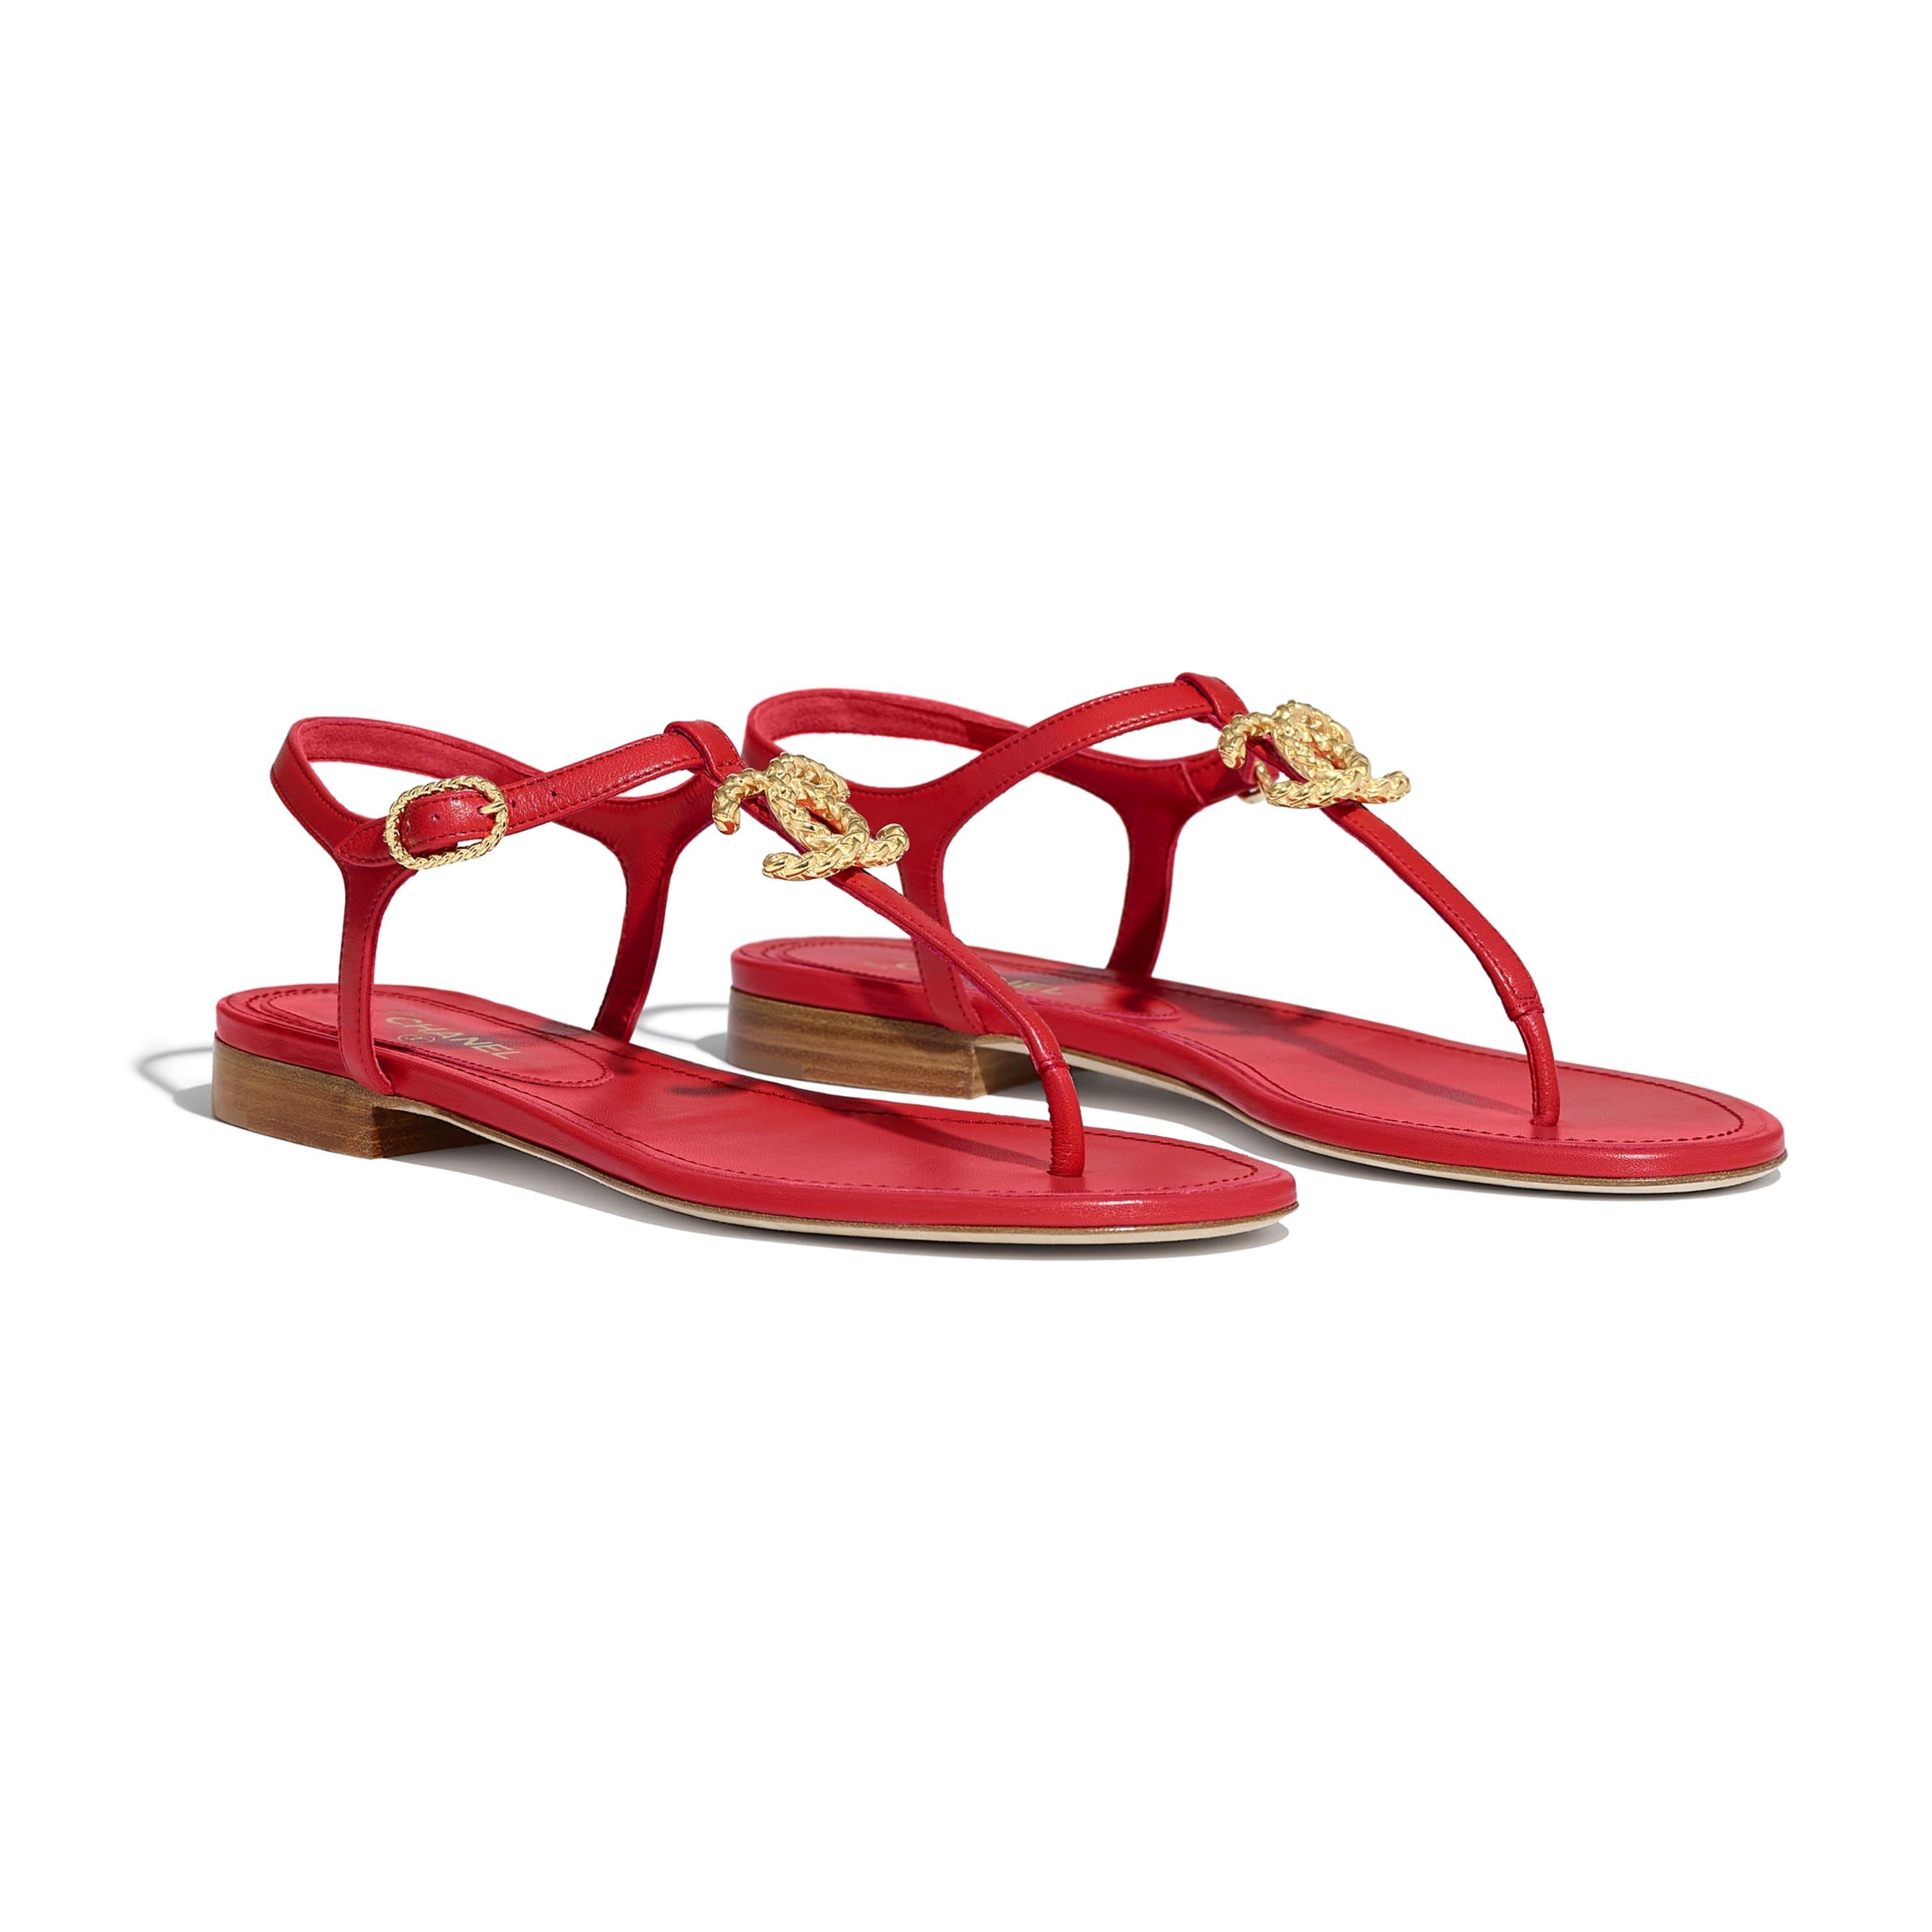 Sandalen - Rot - Lammleder - CHANEL - Alternative Ansicht - Standardgröße anzeigen